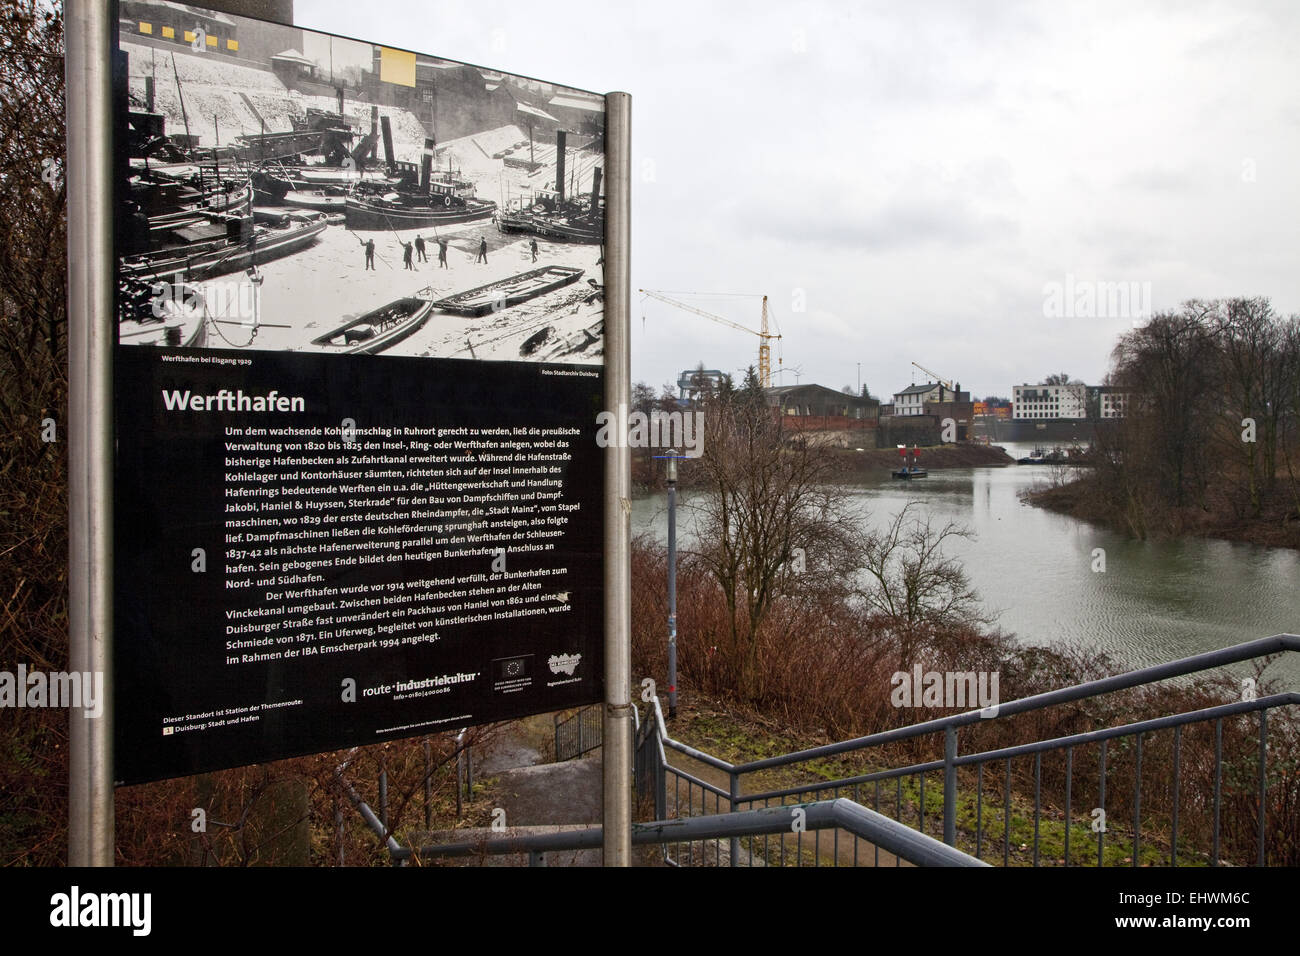 Informartions panel inland port in Duisburg. - Stock Image